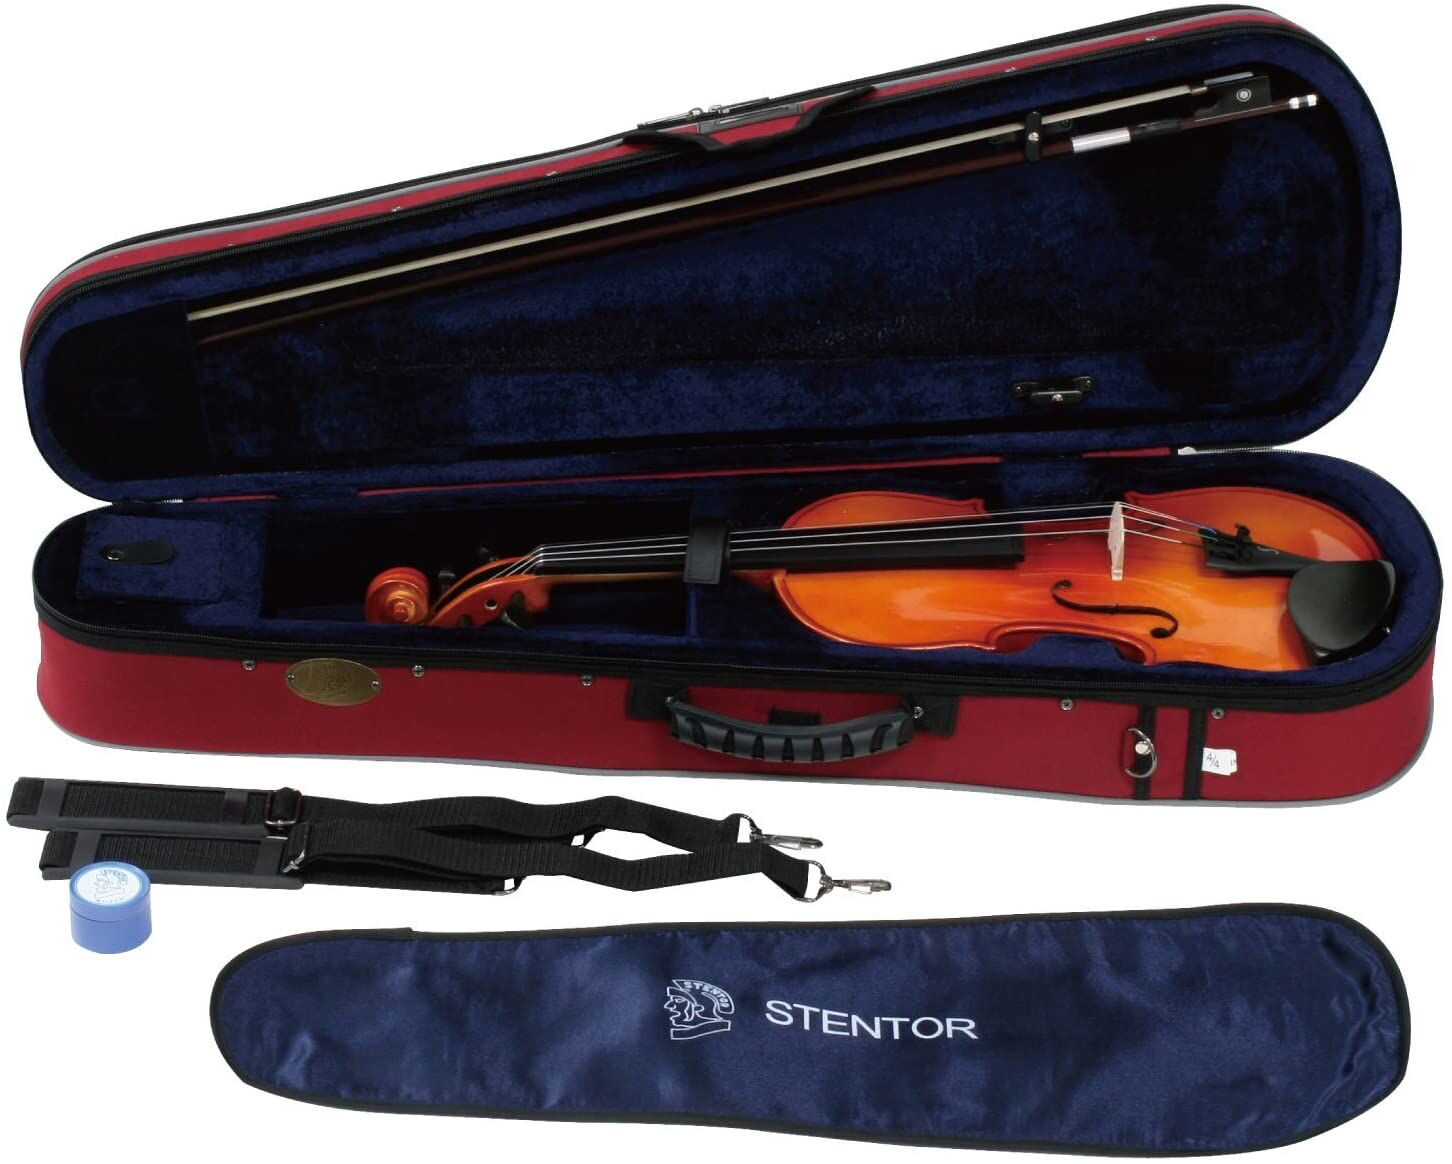 Stentor Student II 1500 Violin